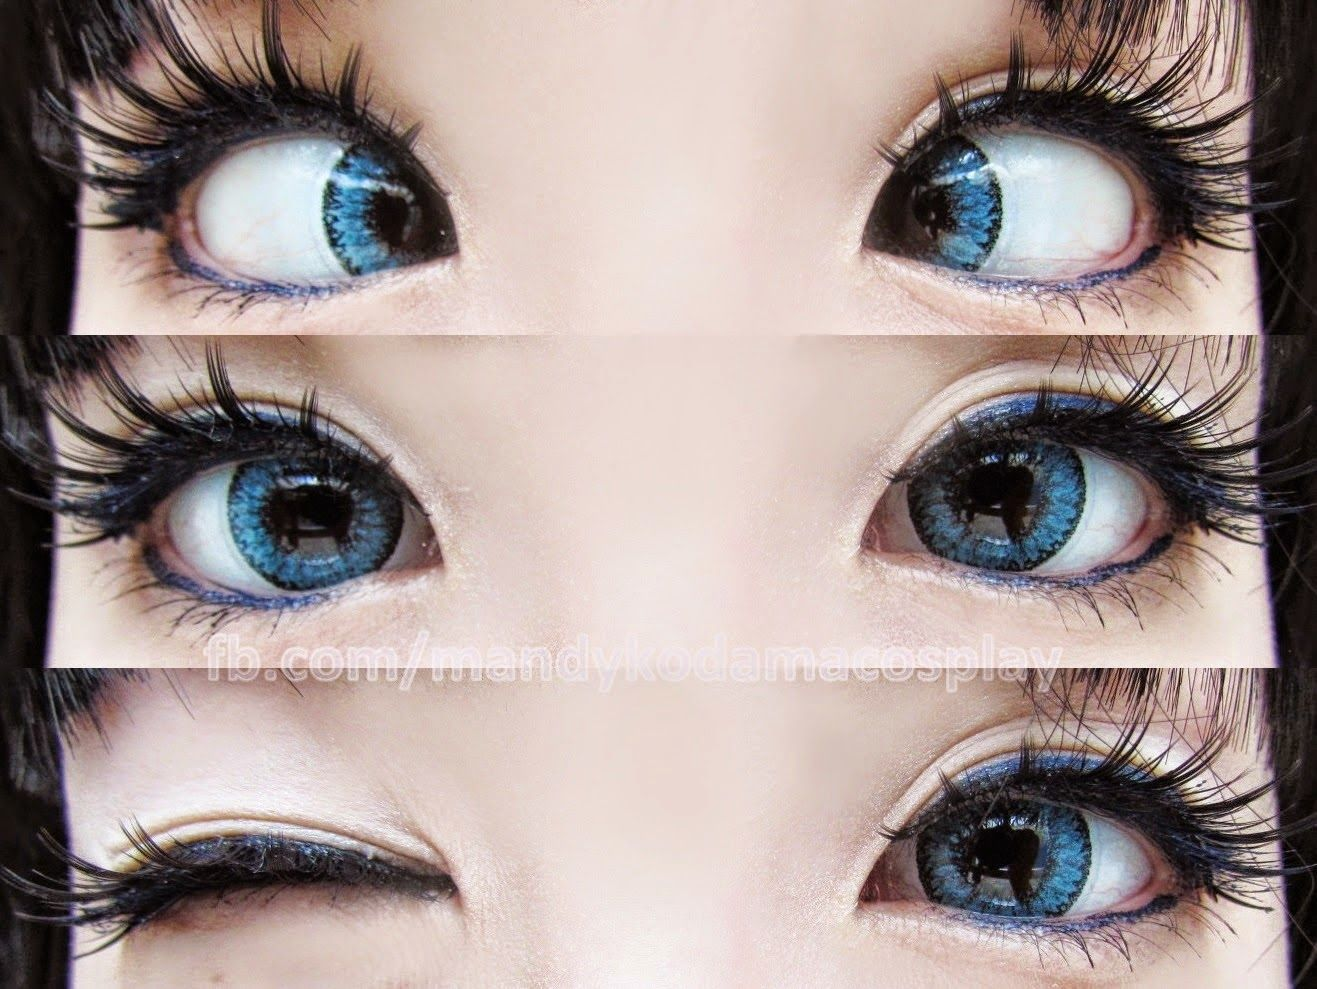 Color contact lenses online shop - Best 25 Circle Lenses Ideas On Pinterest Fashion Contact Lenses Anime Makeup And Gyaru Makeup